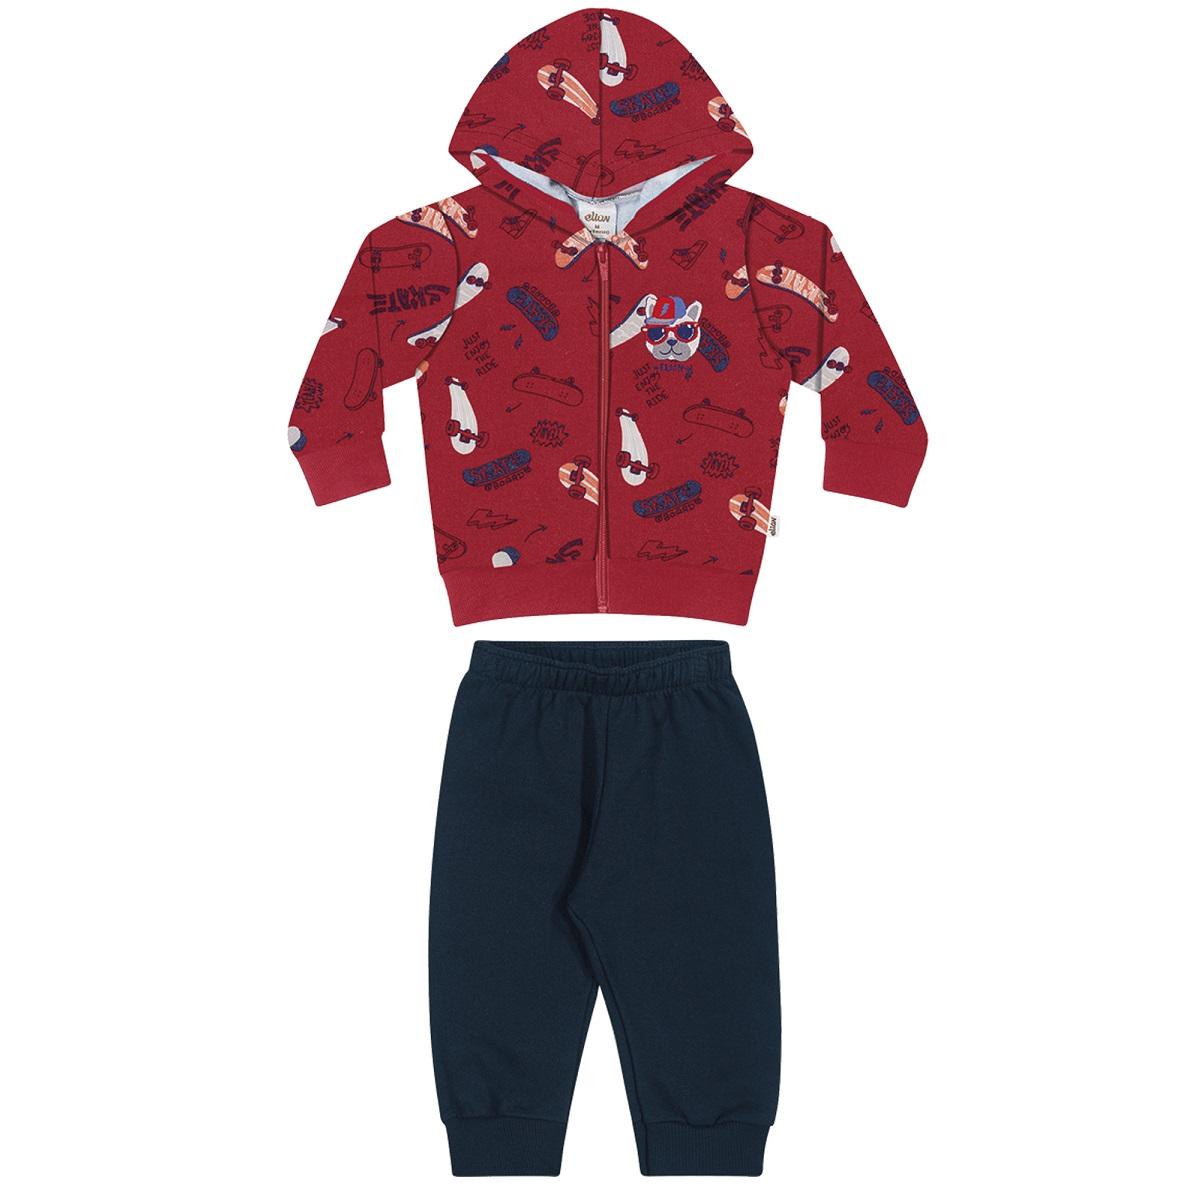 Conjunto Infantil Masculino Jaqueta e Calça - ELIAN 20929